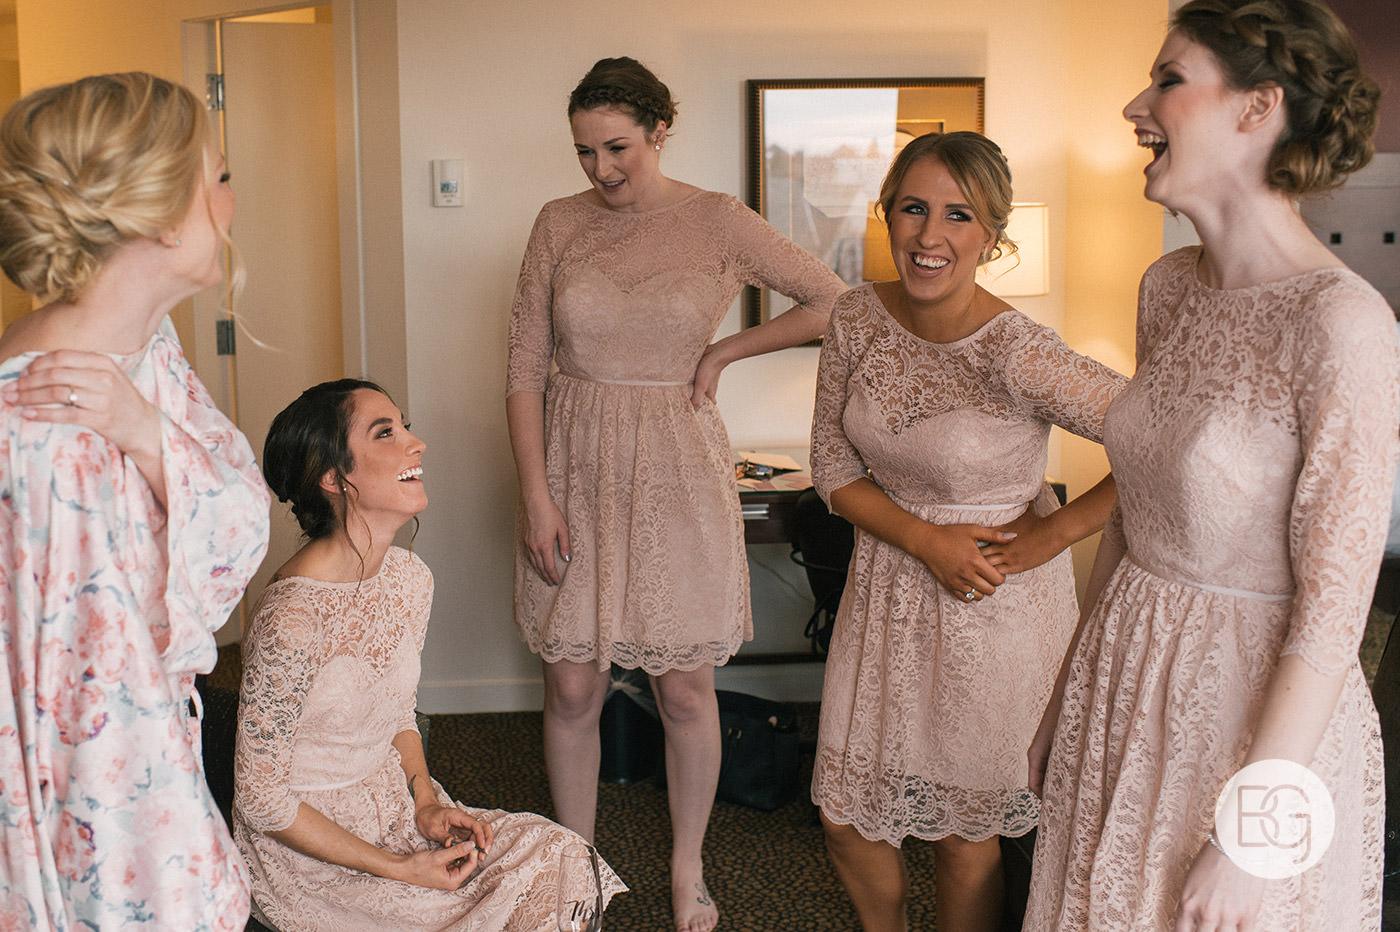 Edmonton_wedding_photographers_josh_sara_whyte_02.jpg